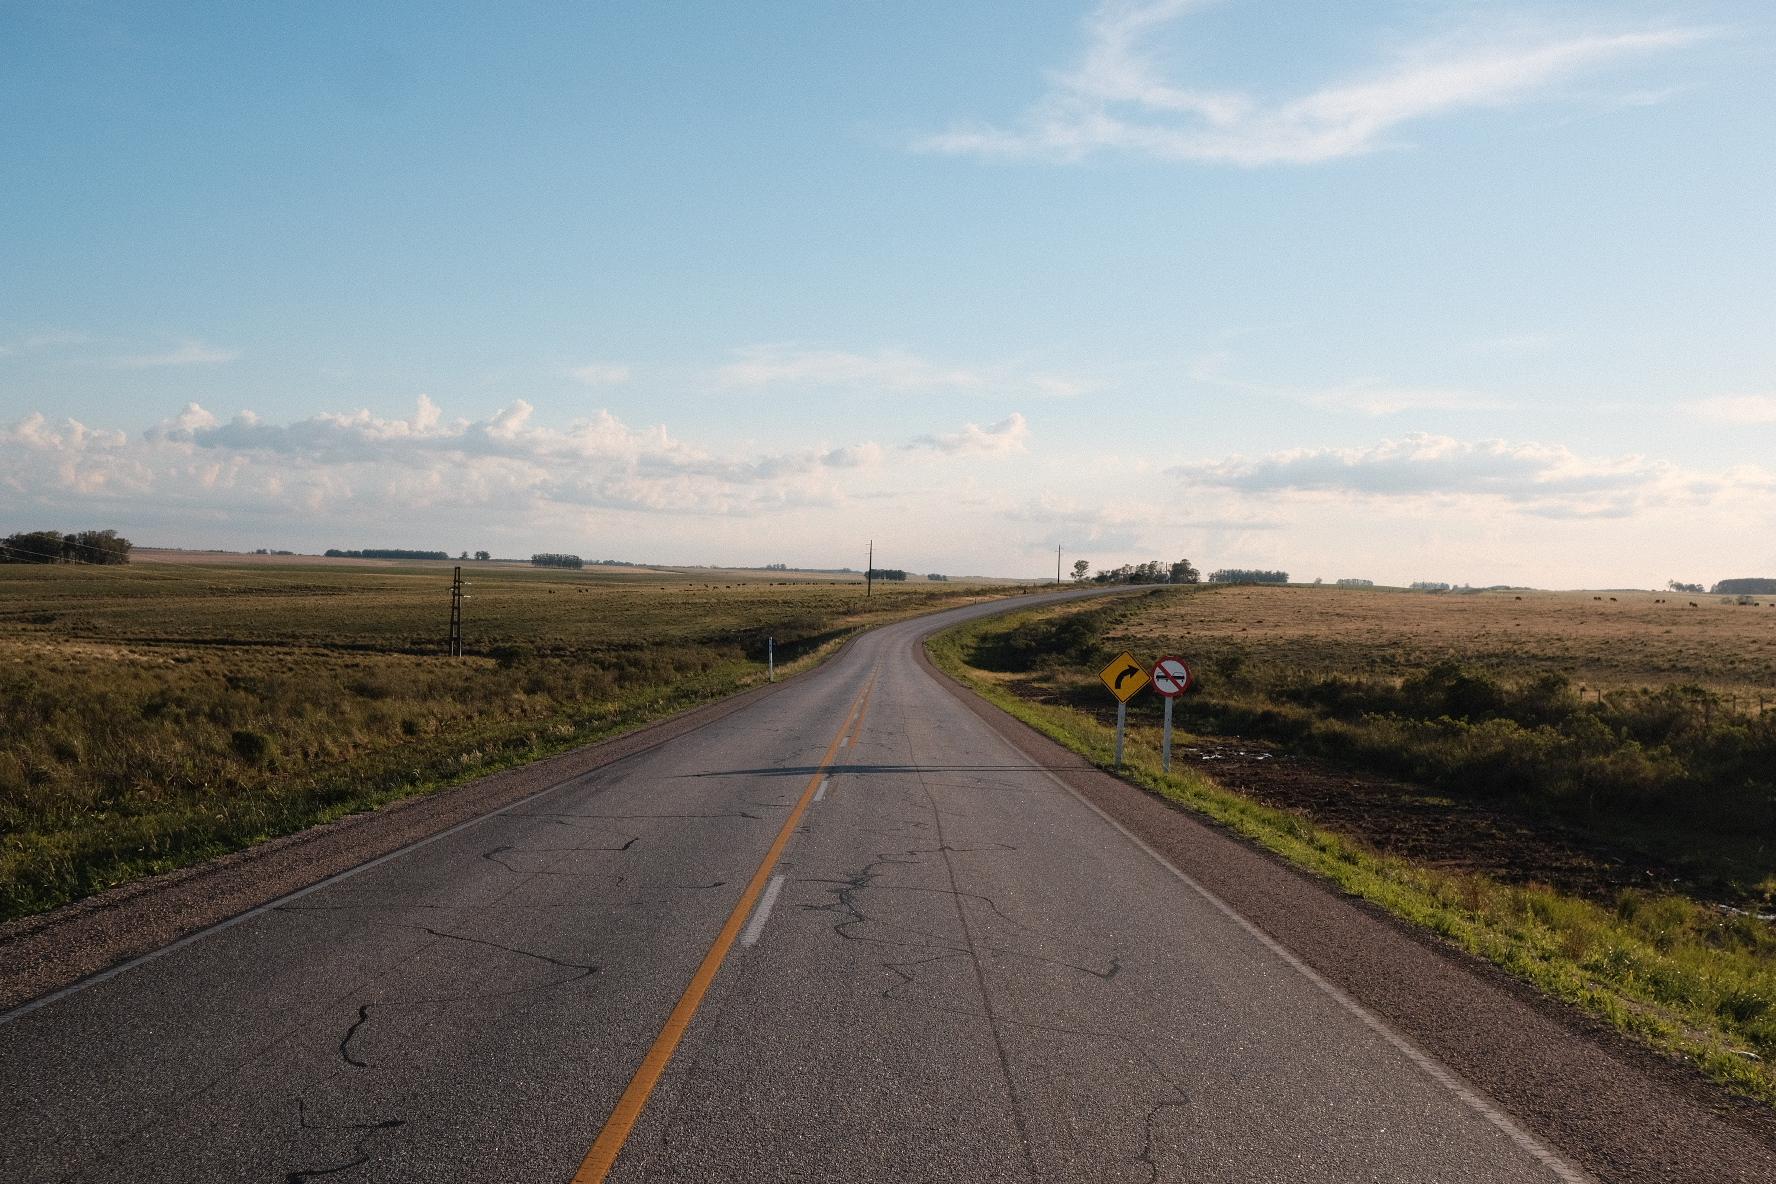 Driving on Uruguayense highways.